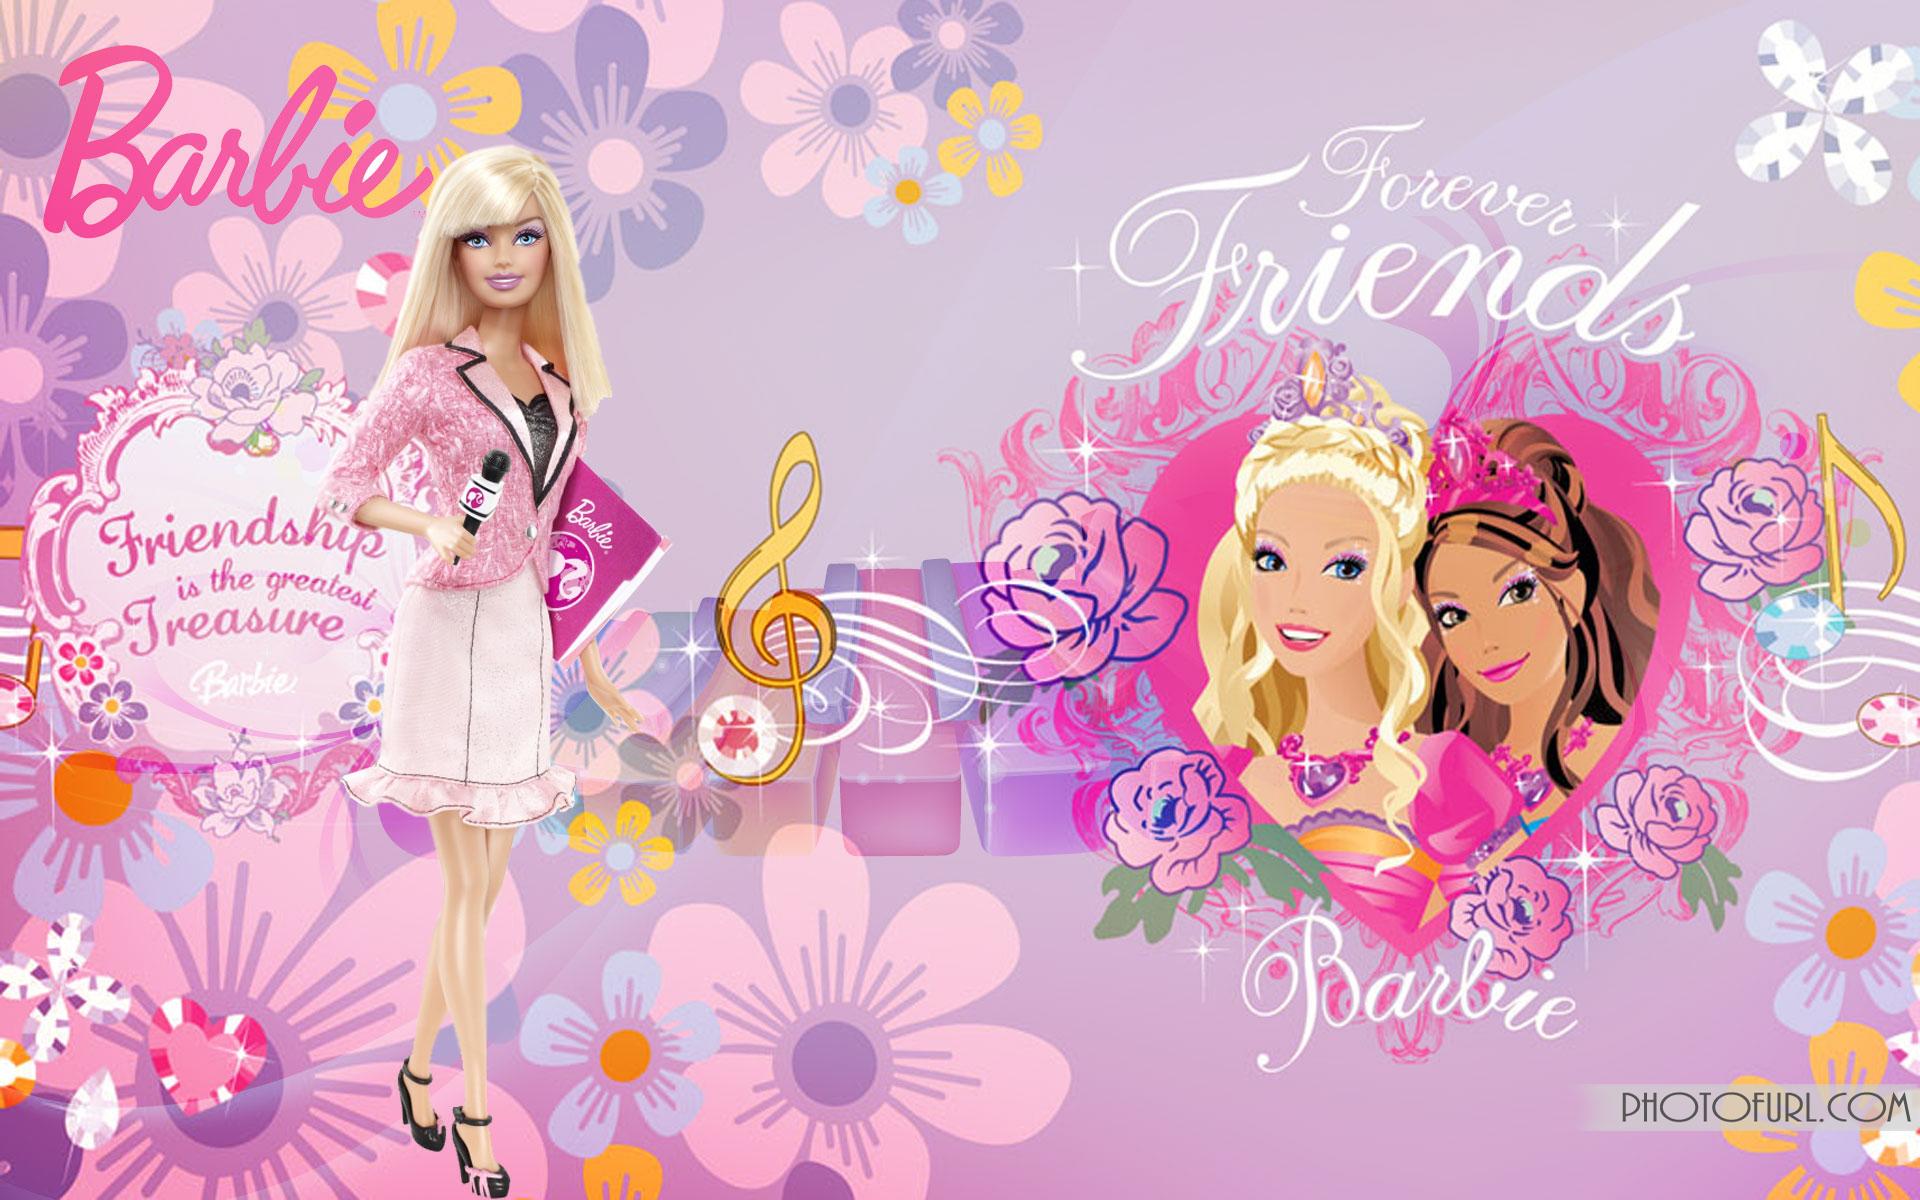 Fantastic Wallpaper Butterfly Barbie - qmDed6  Pic_29330.jpg